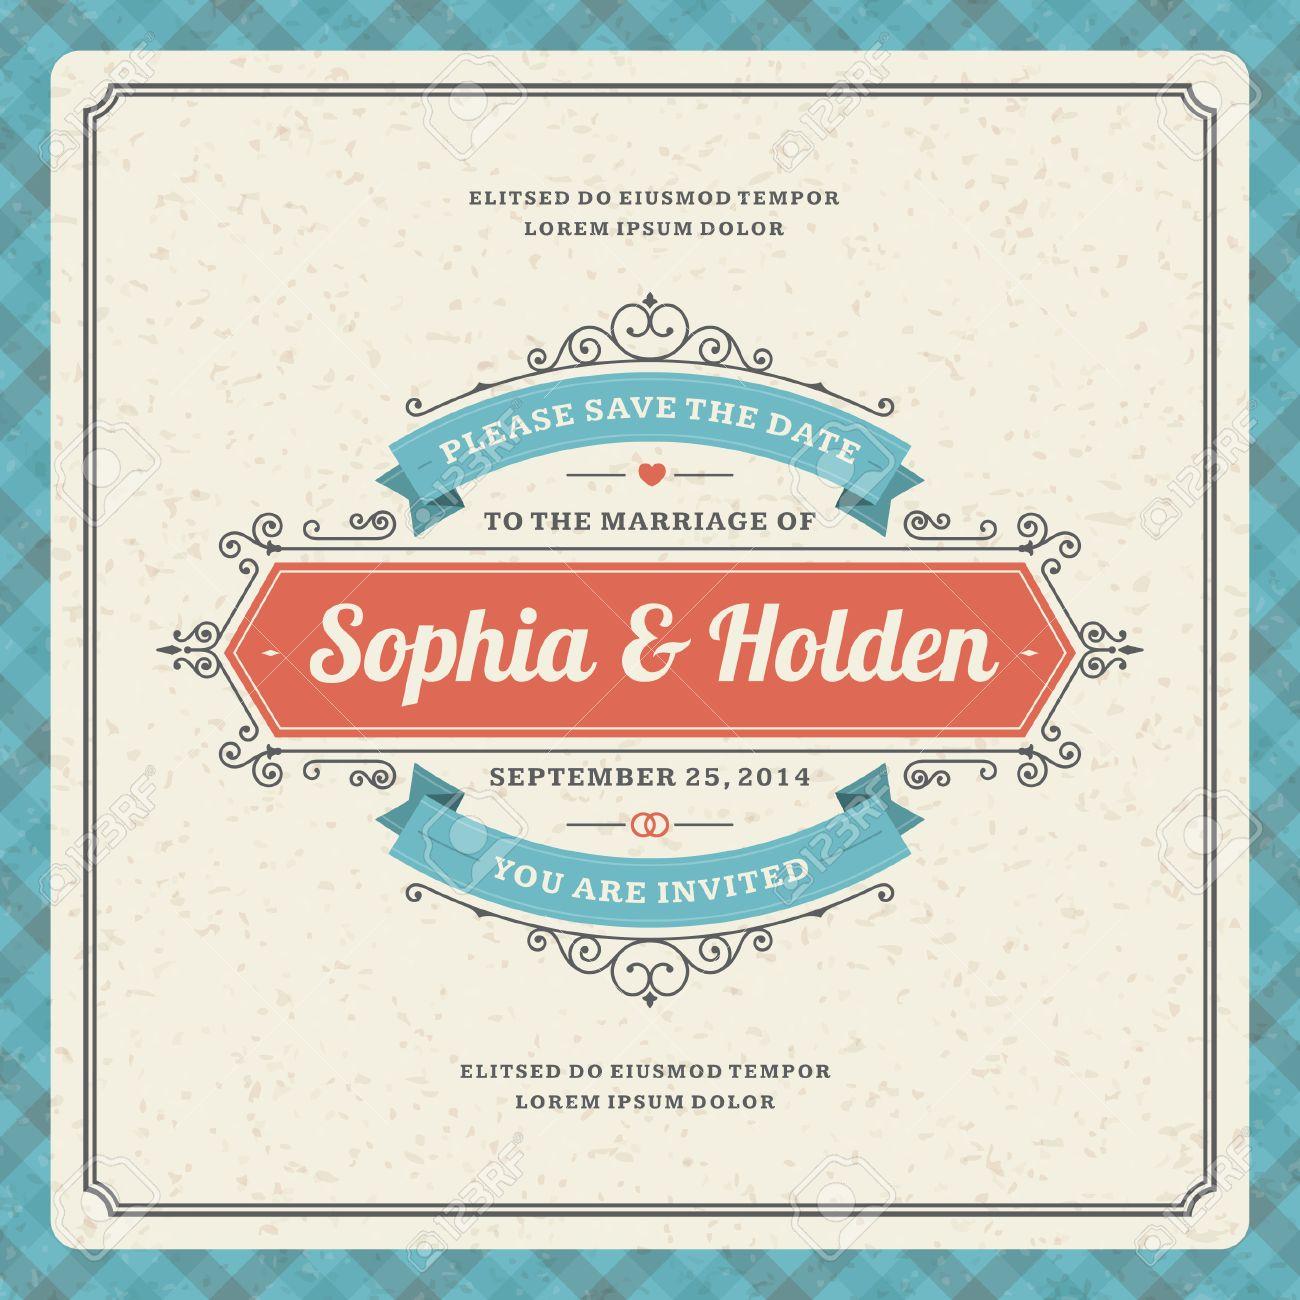 wedding invitation card template vintage background retro flourish